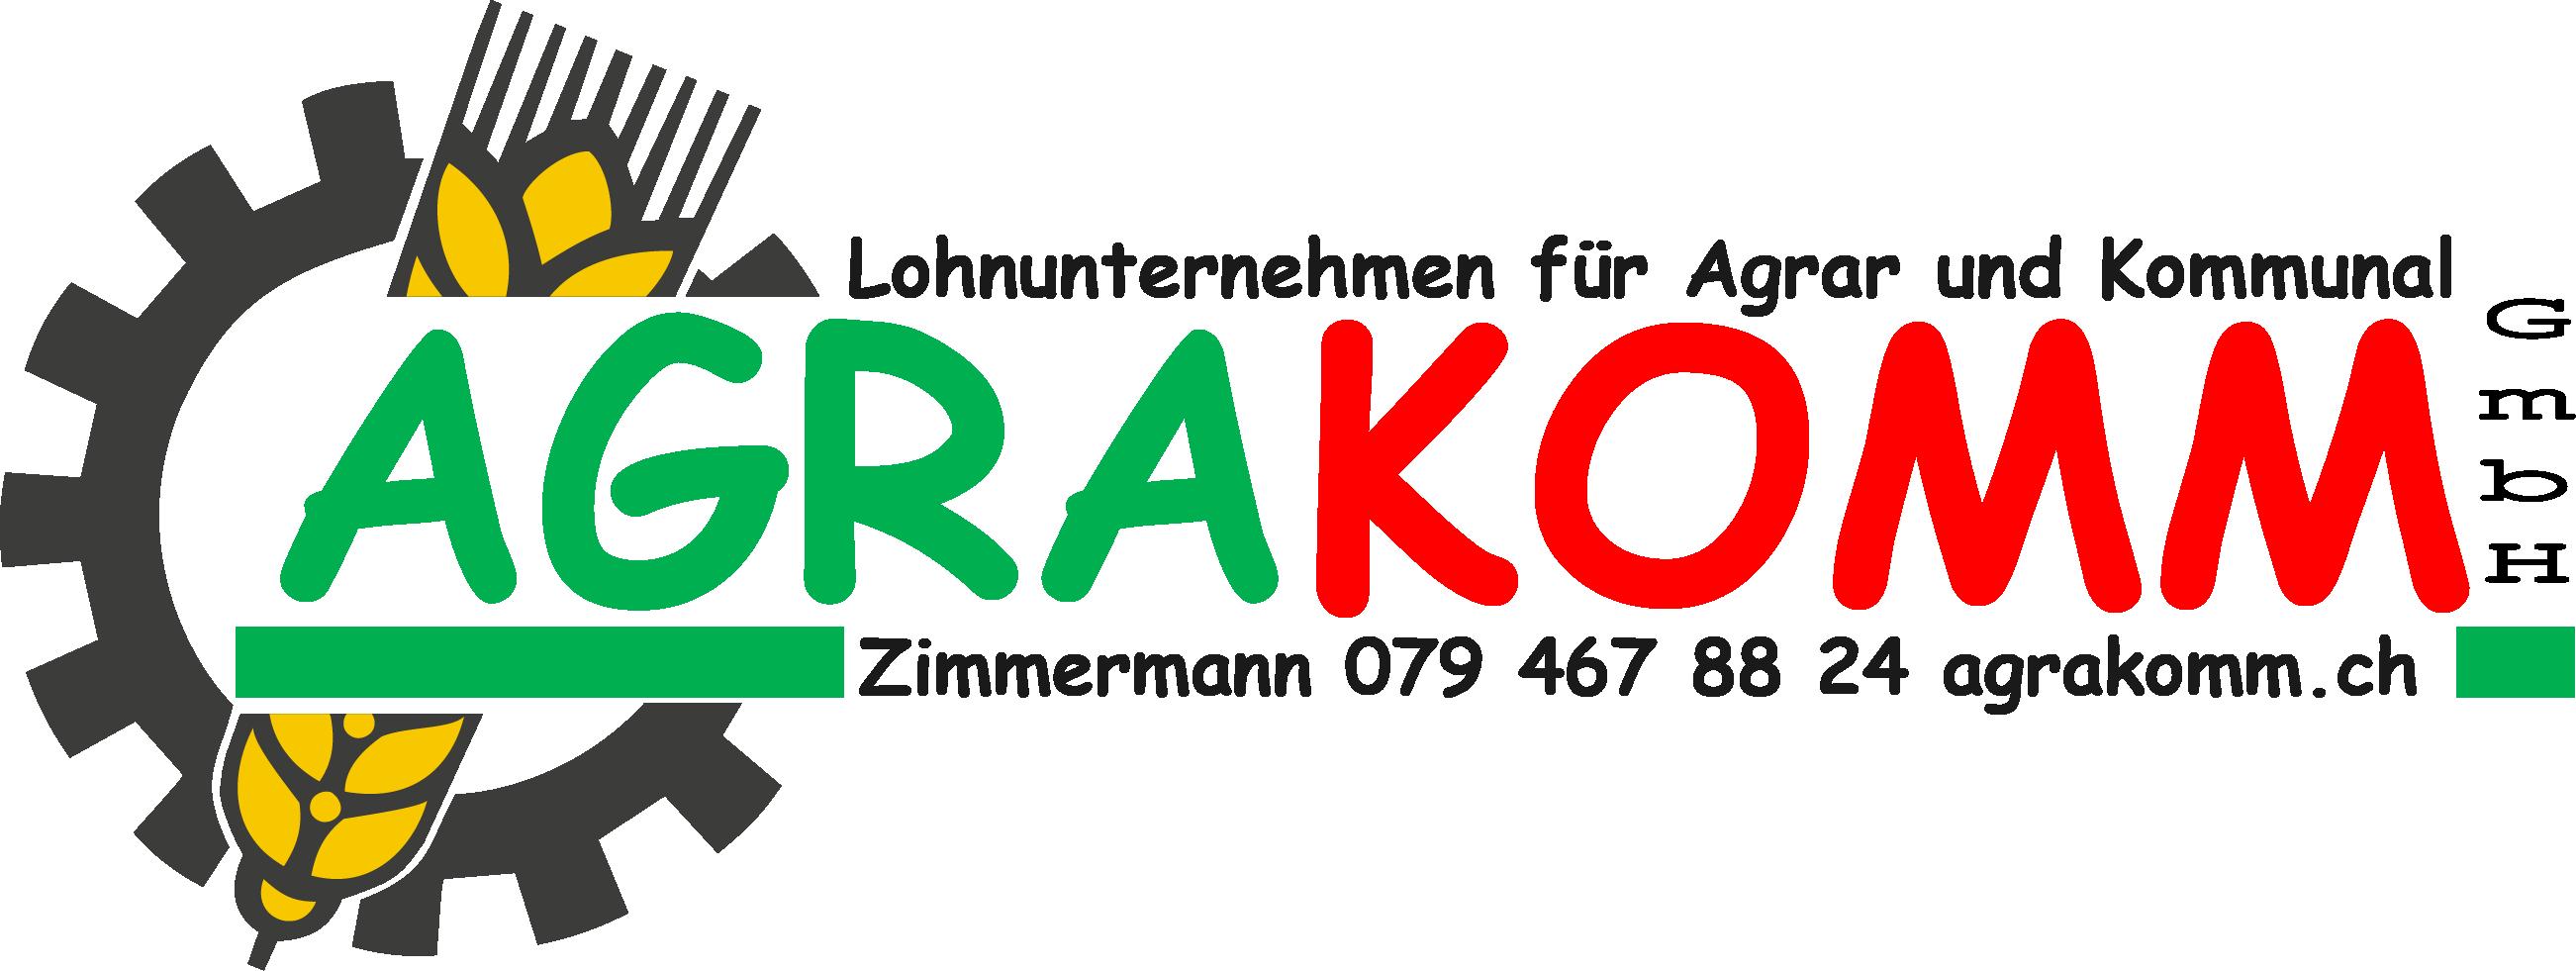 Logo AgraKomm GmbH - Partner der Landtechnik Müller